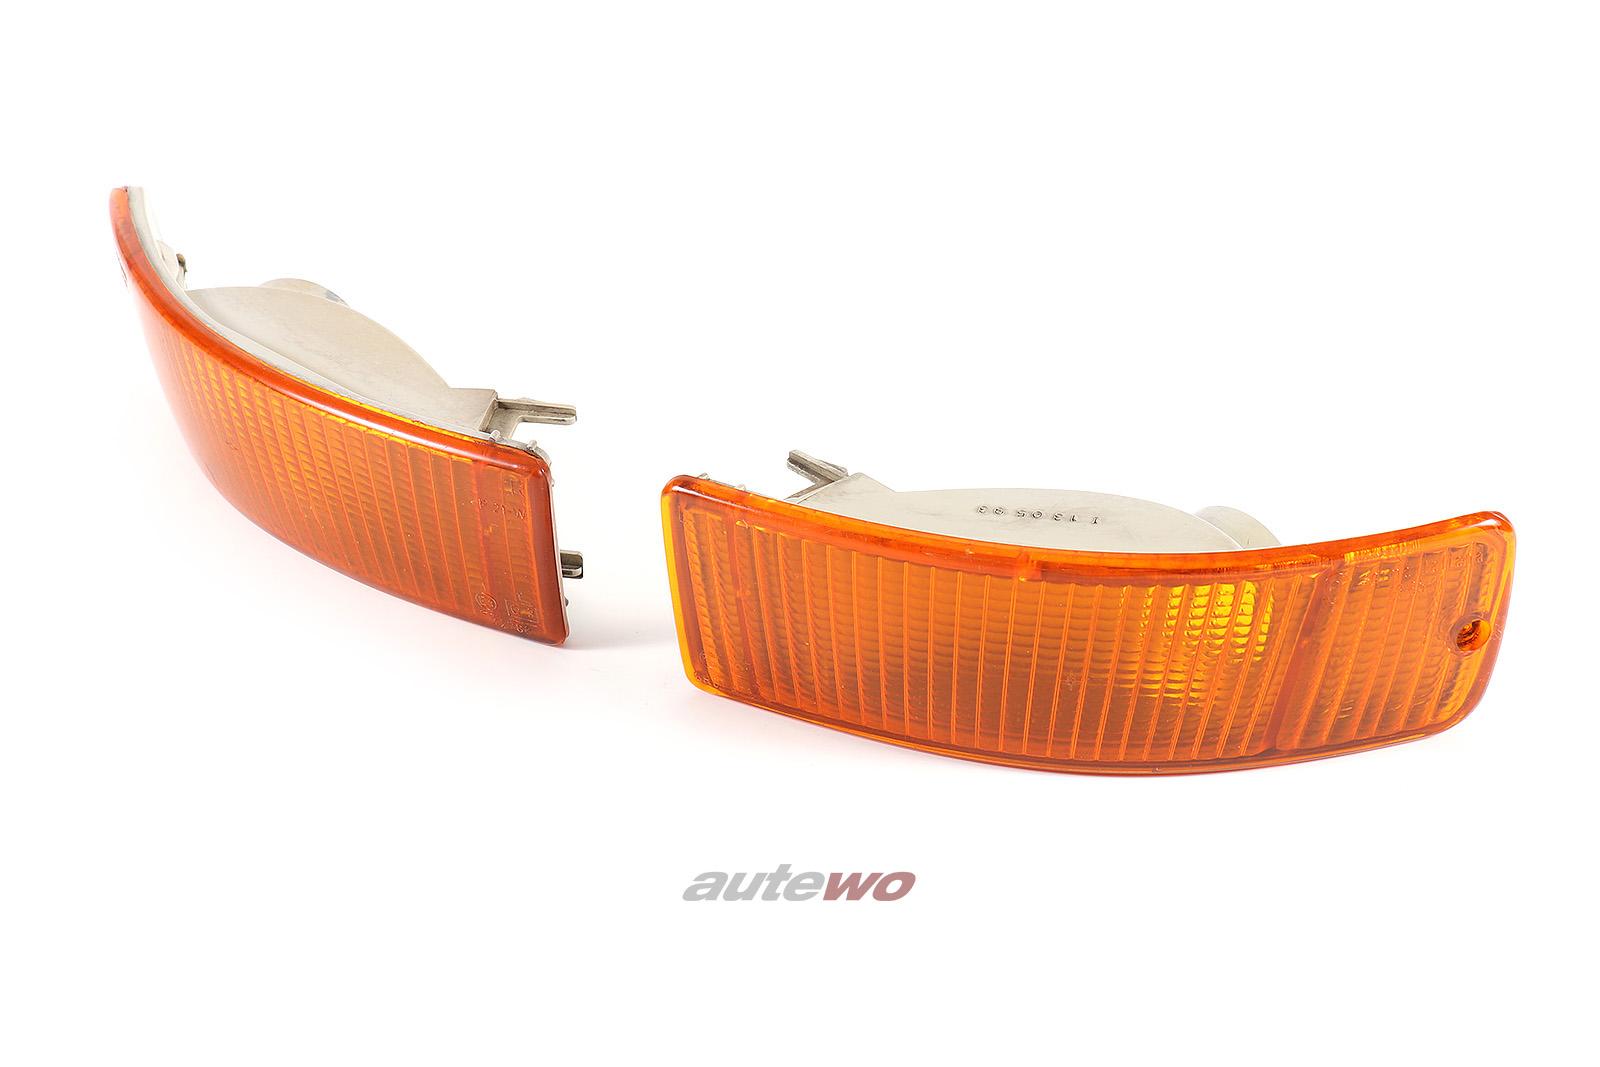 8A0953049A/8A0953050A Audi 80 B4/Coupe/Cabrio Typ 89/S2 Blinker Paar orange